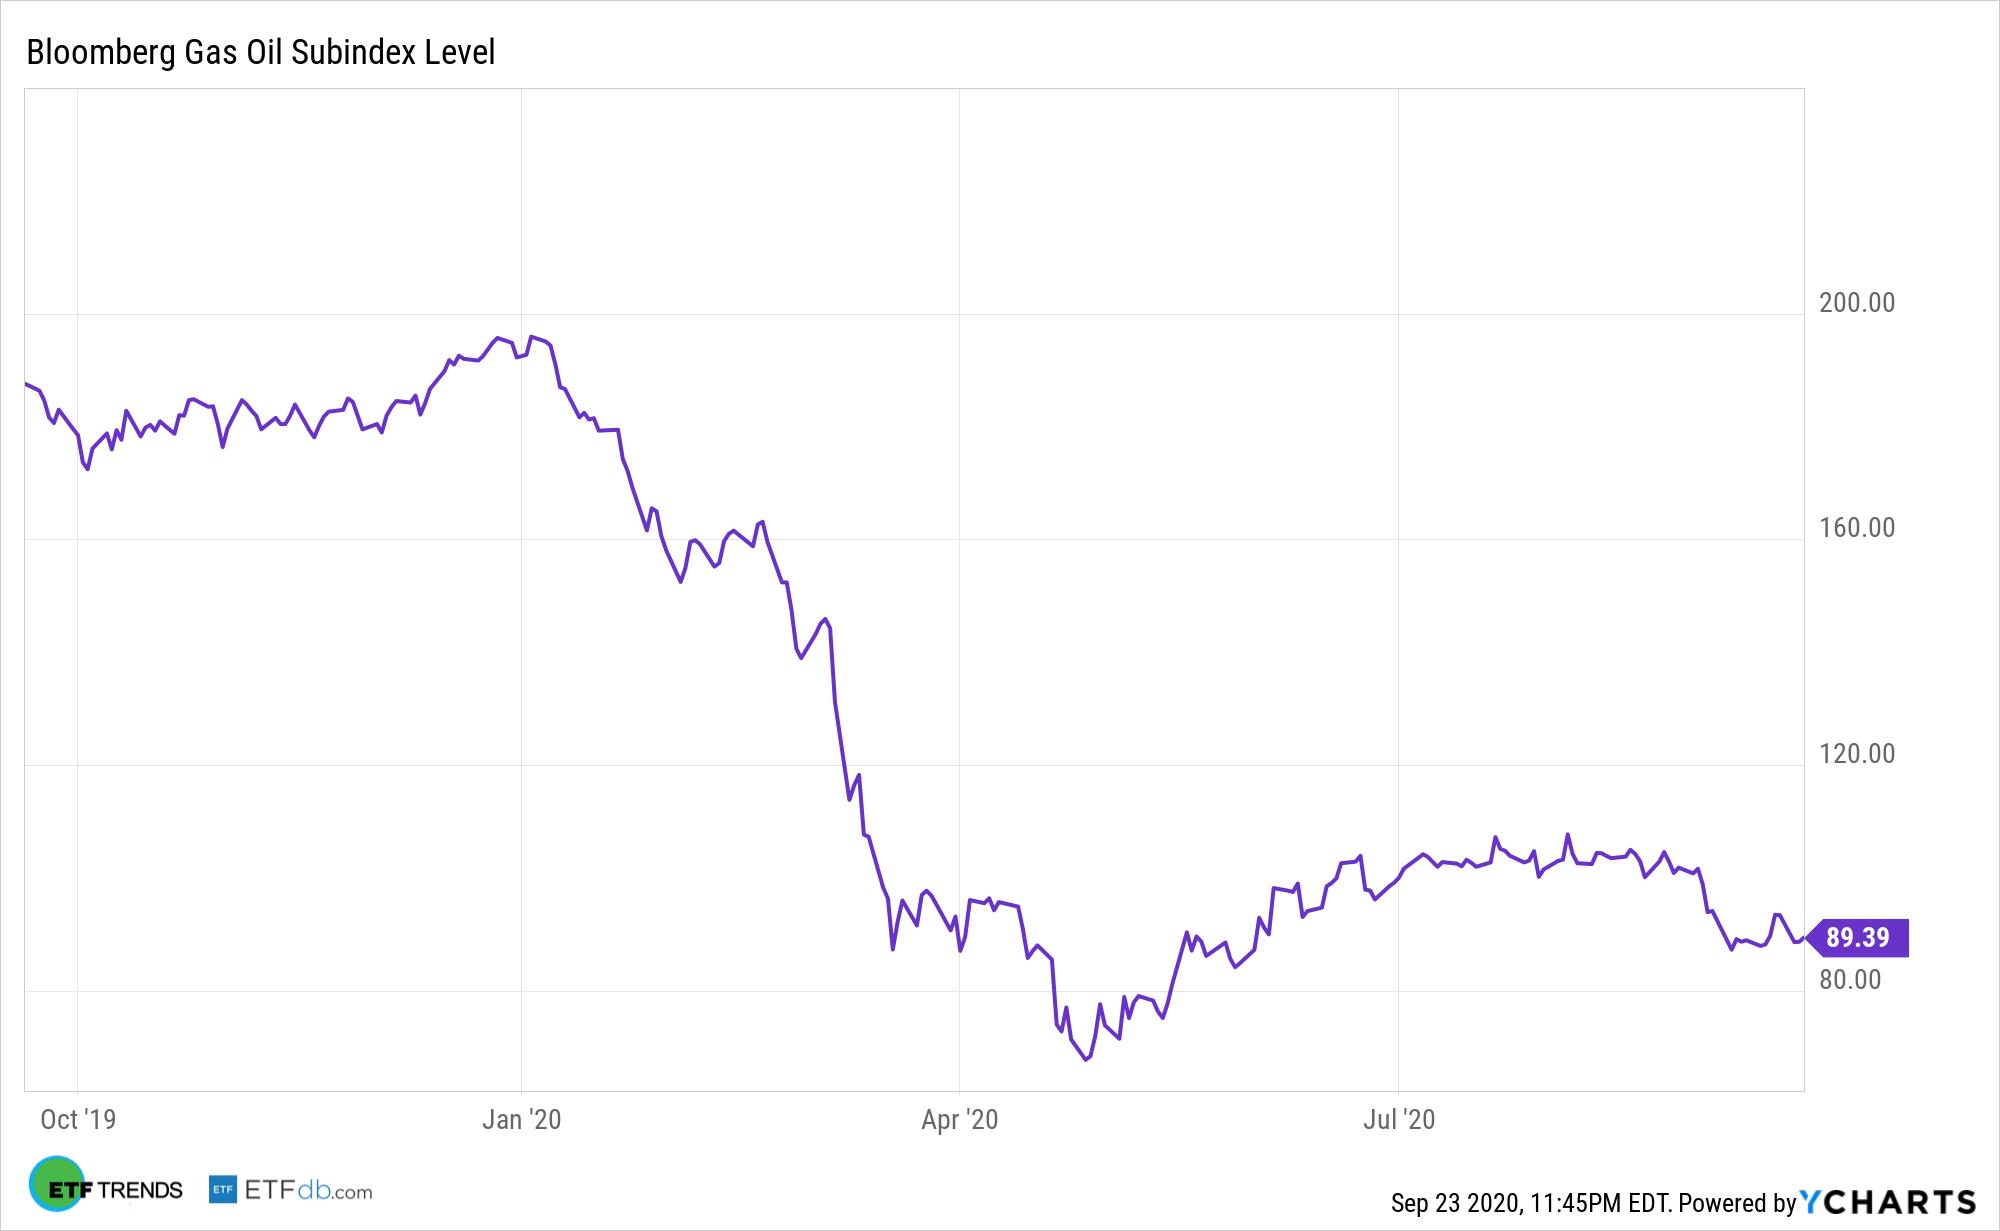 ^BGOS Chart